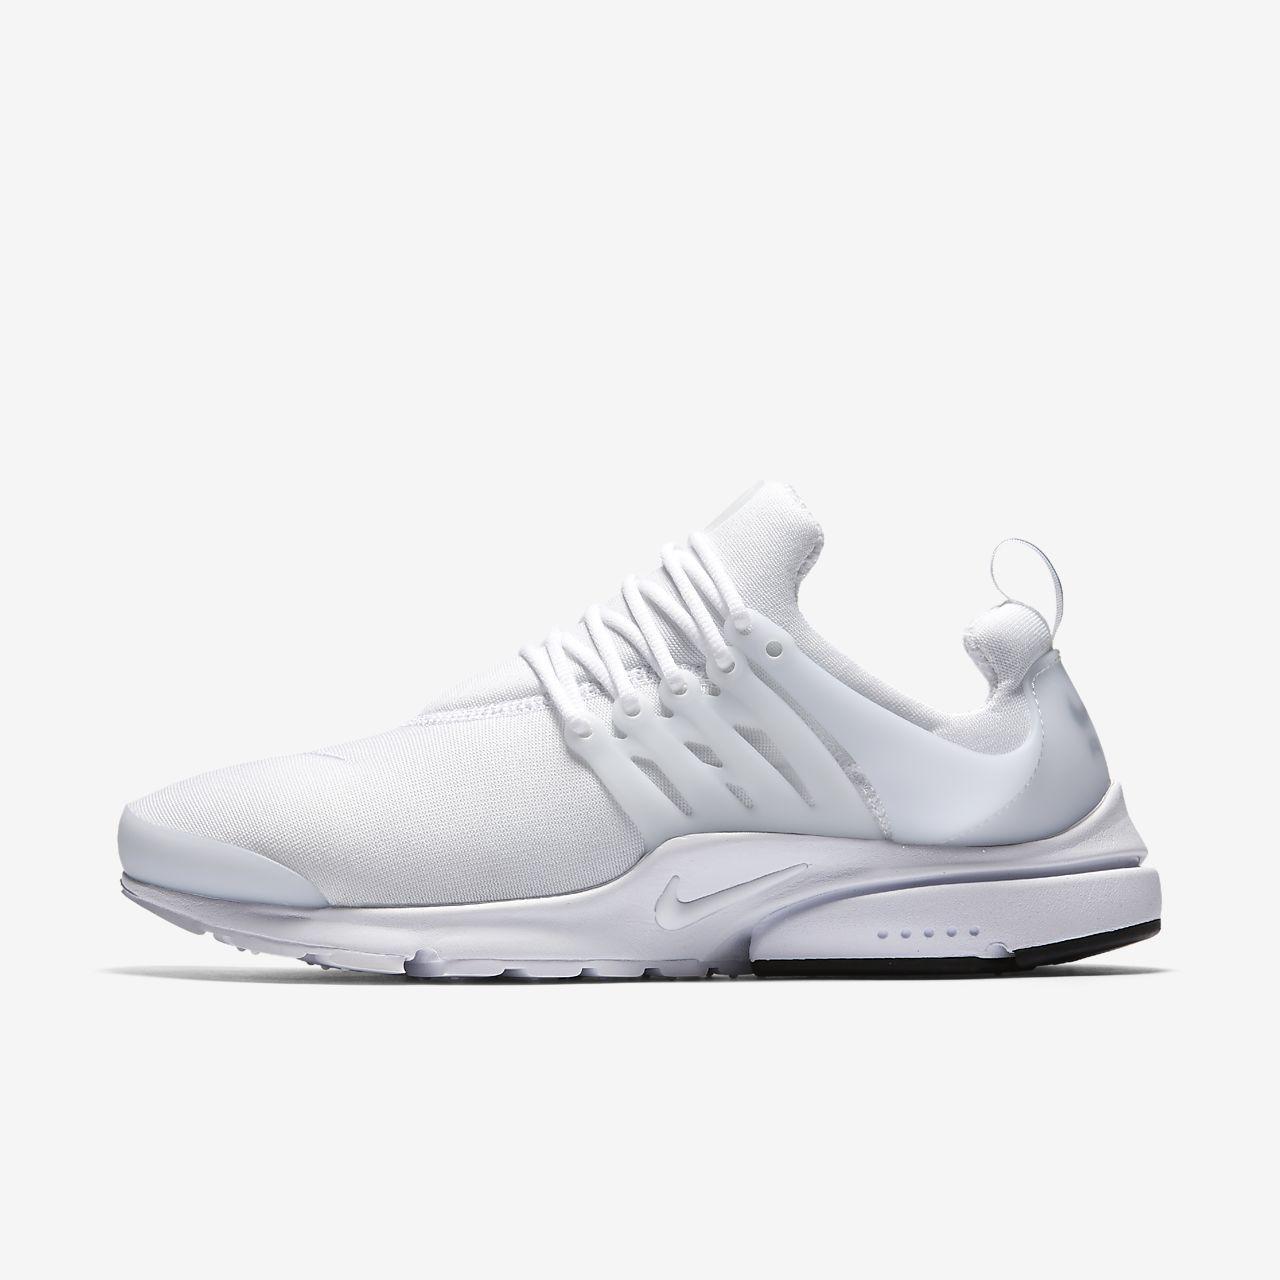 Nike Air Presto Essential Men S Shoe Nike Air Presto White Nike Air Presto Mens Nike Shoes